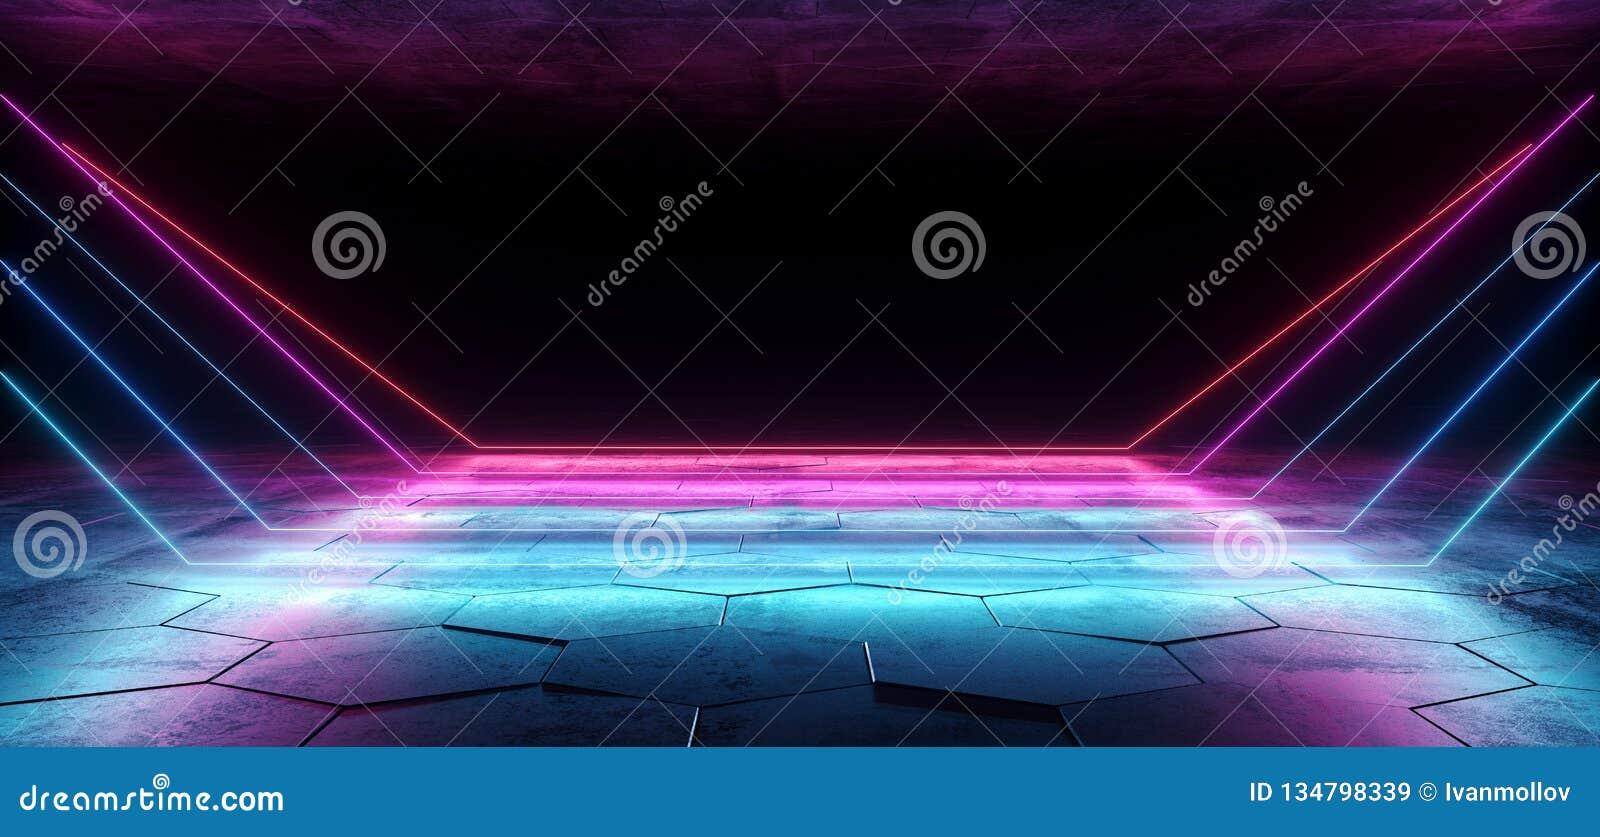 O laser de néon abstrato de Sci Fi conduziu linhas futuristas de incandescência do roxo azul cor-de-rosa na sala sextavada concre